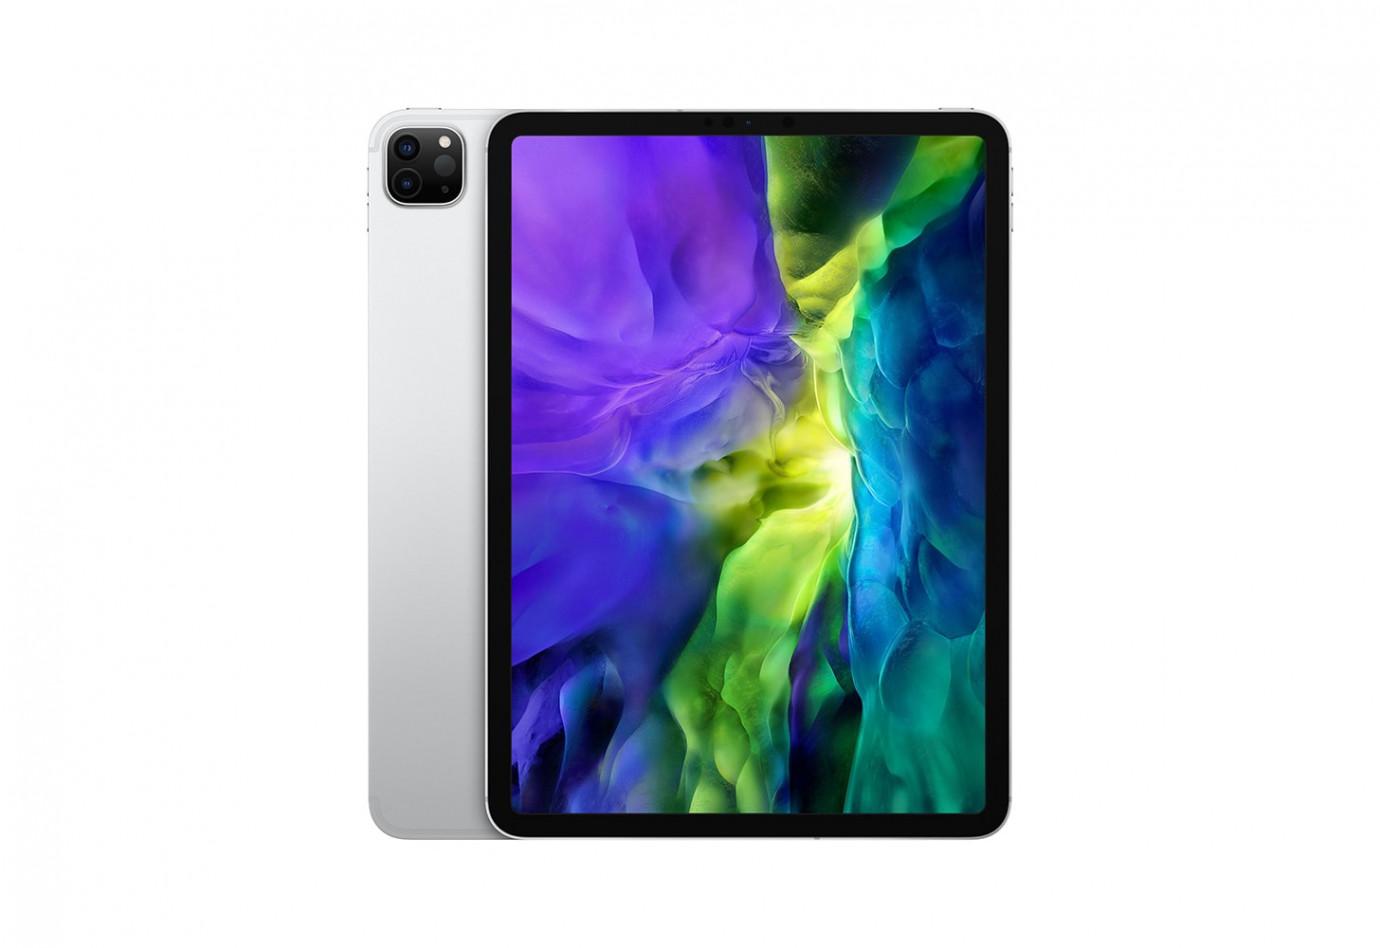 https://dpyxfisjd0mft.cloudfront.net/lab9-2/2019/Products/Apple/iPad%20Pro%202020/ipadpro-11-cell-s-1.jpg?1585077893&w=1456&h=1000